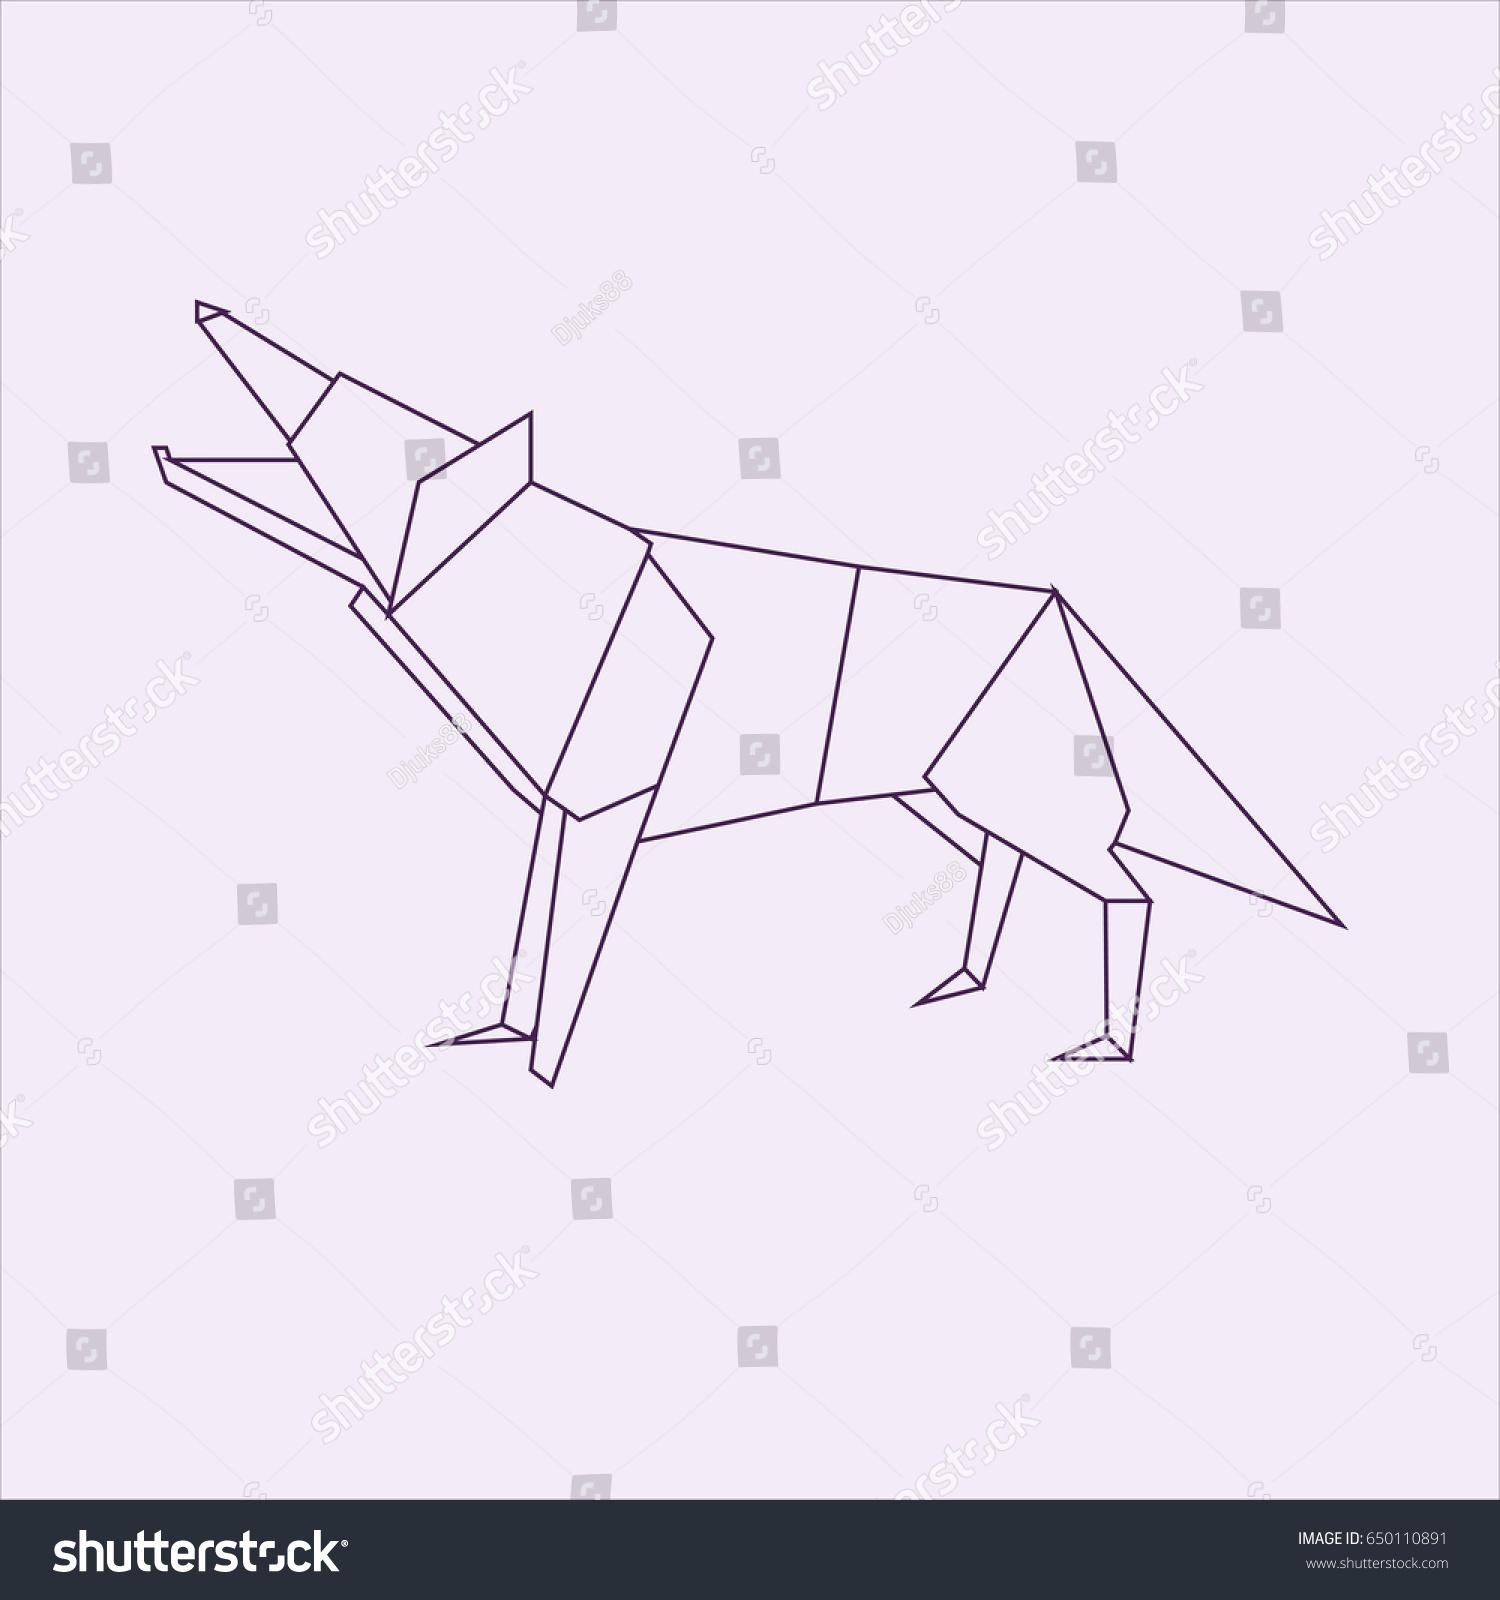 Wolf Origami Stock Illustration 650110891 Shutterstock